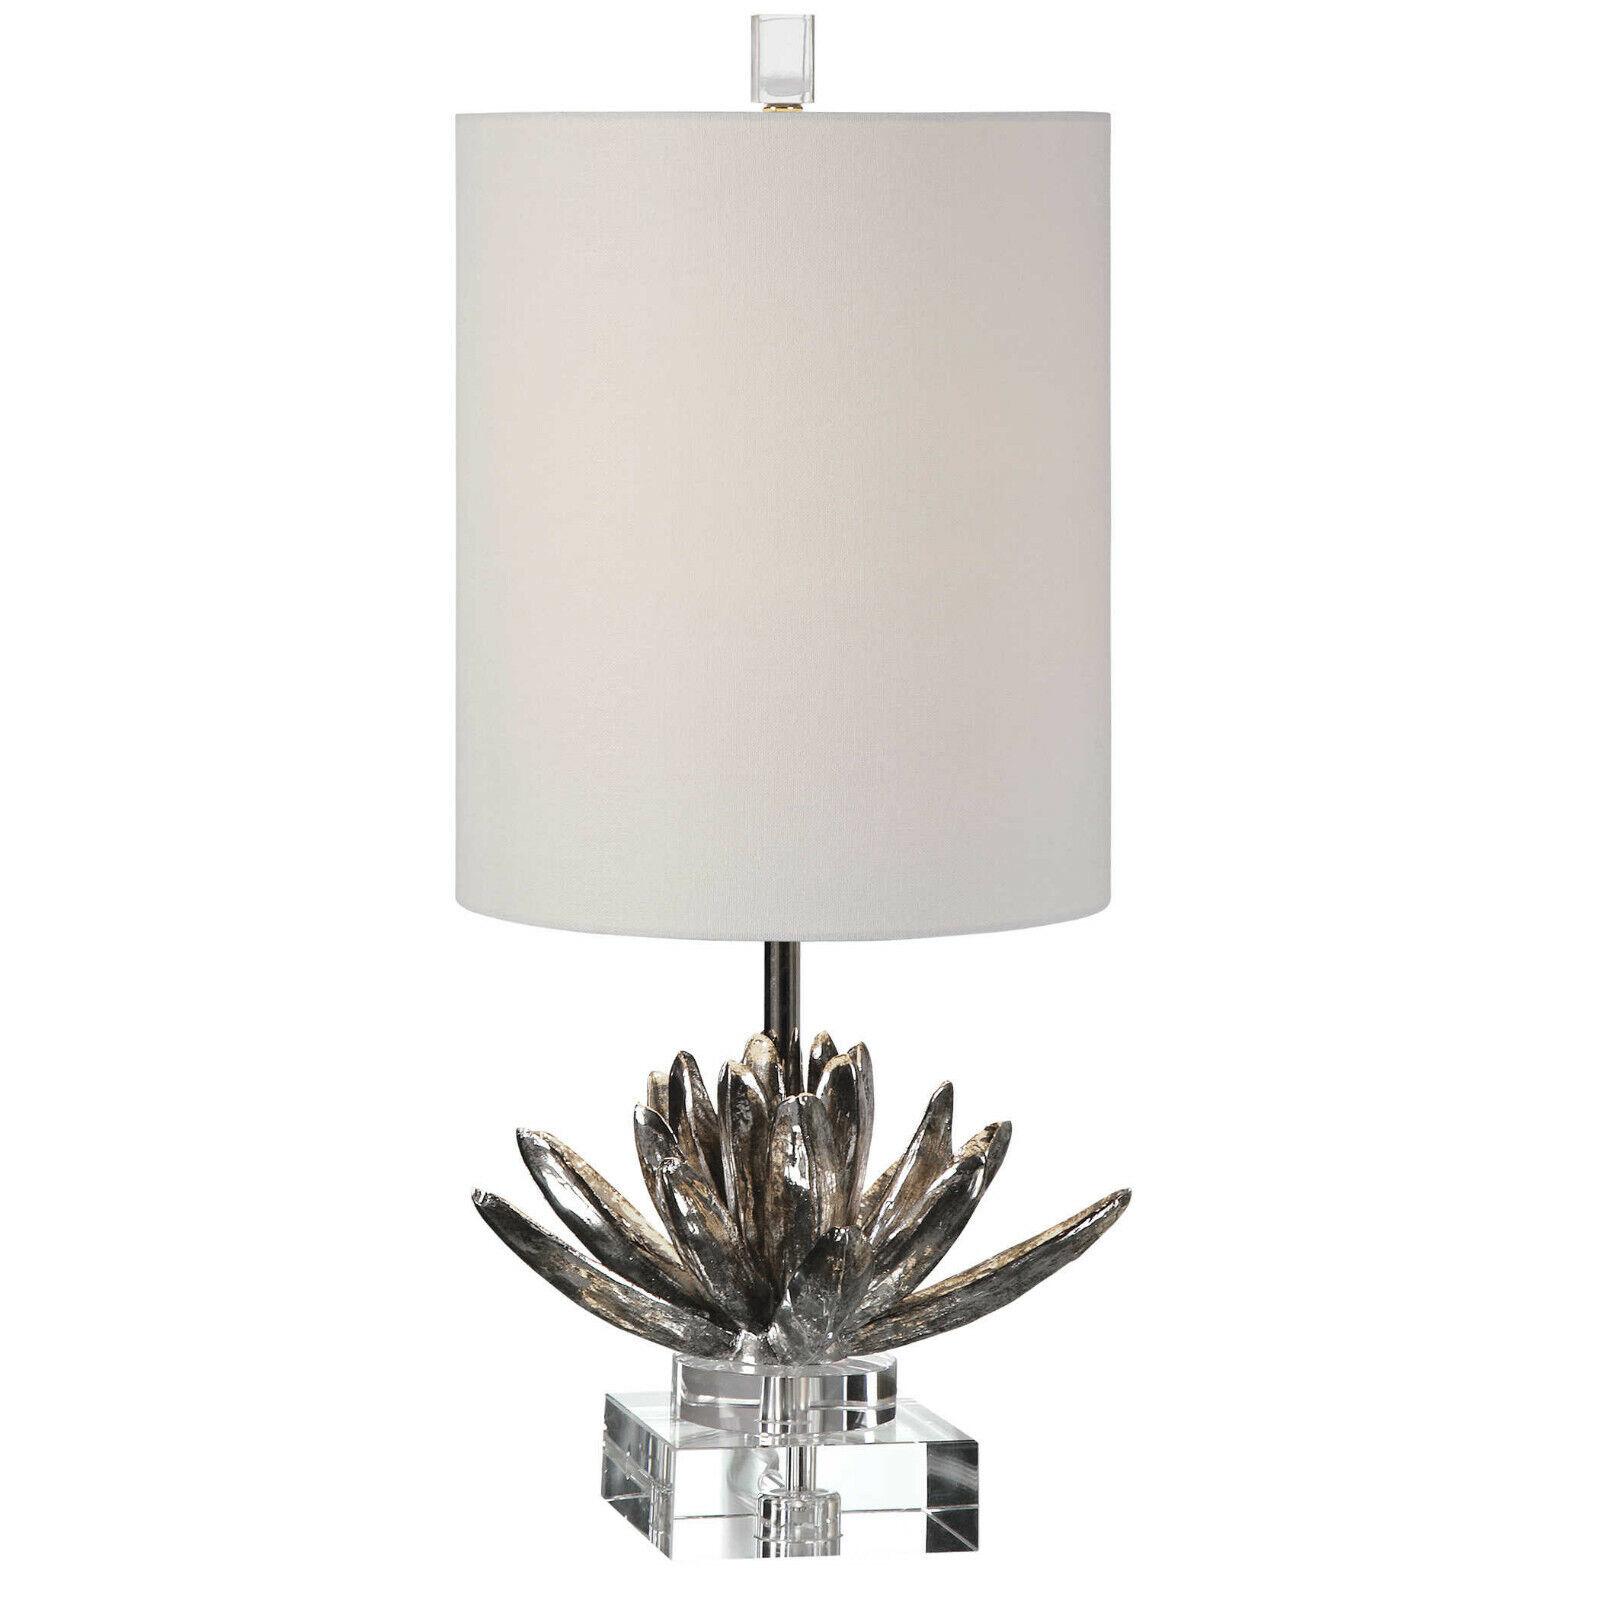 Lotus Flower Bloom Table Lamp Metallic Silver Crystal Base Uttermost 29256 For Sale Online